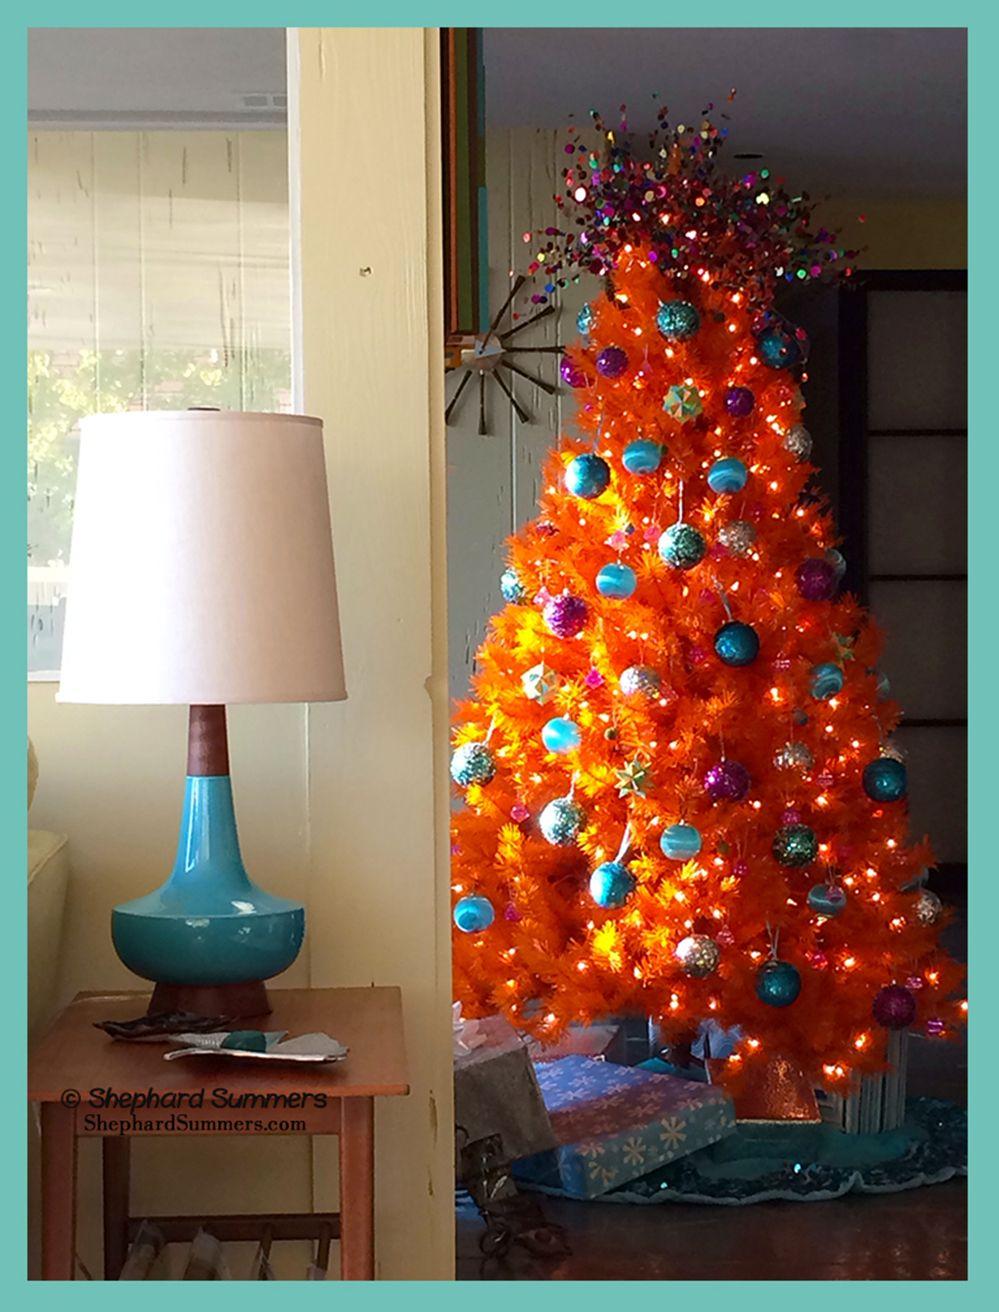 Christmas Tree Orange Aqua Christmas Holiday Decor Decorations Ornaments Mcm Midcentury Orange Christmas Tree Cool Christmas Trees Orange Christmas